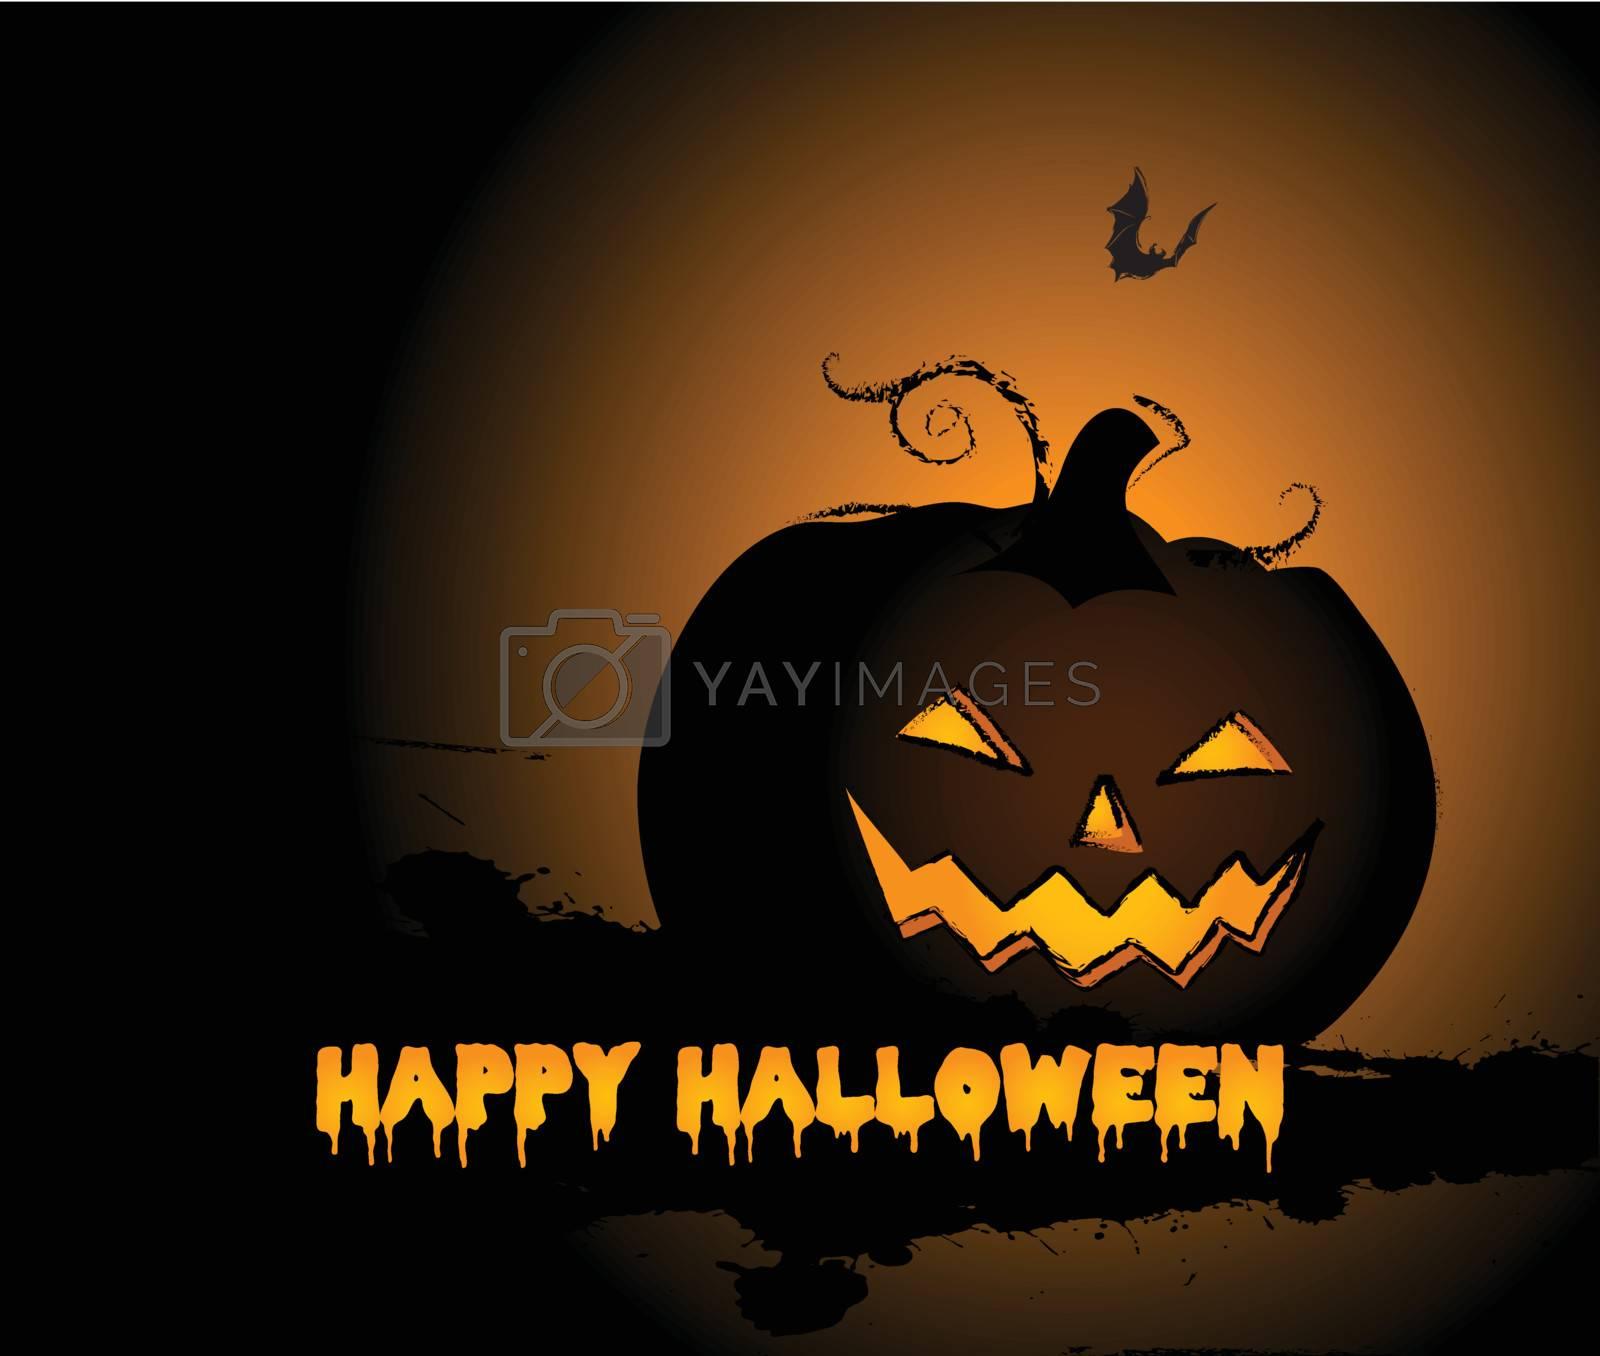 Halloween Pumpkin background and bat